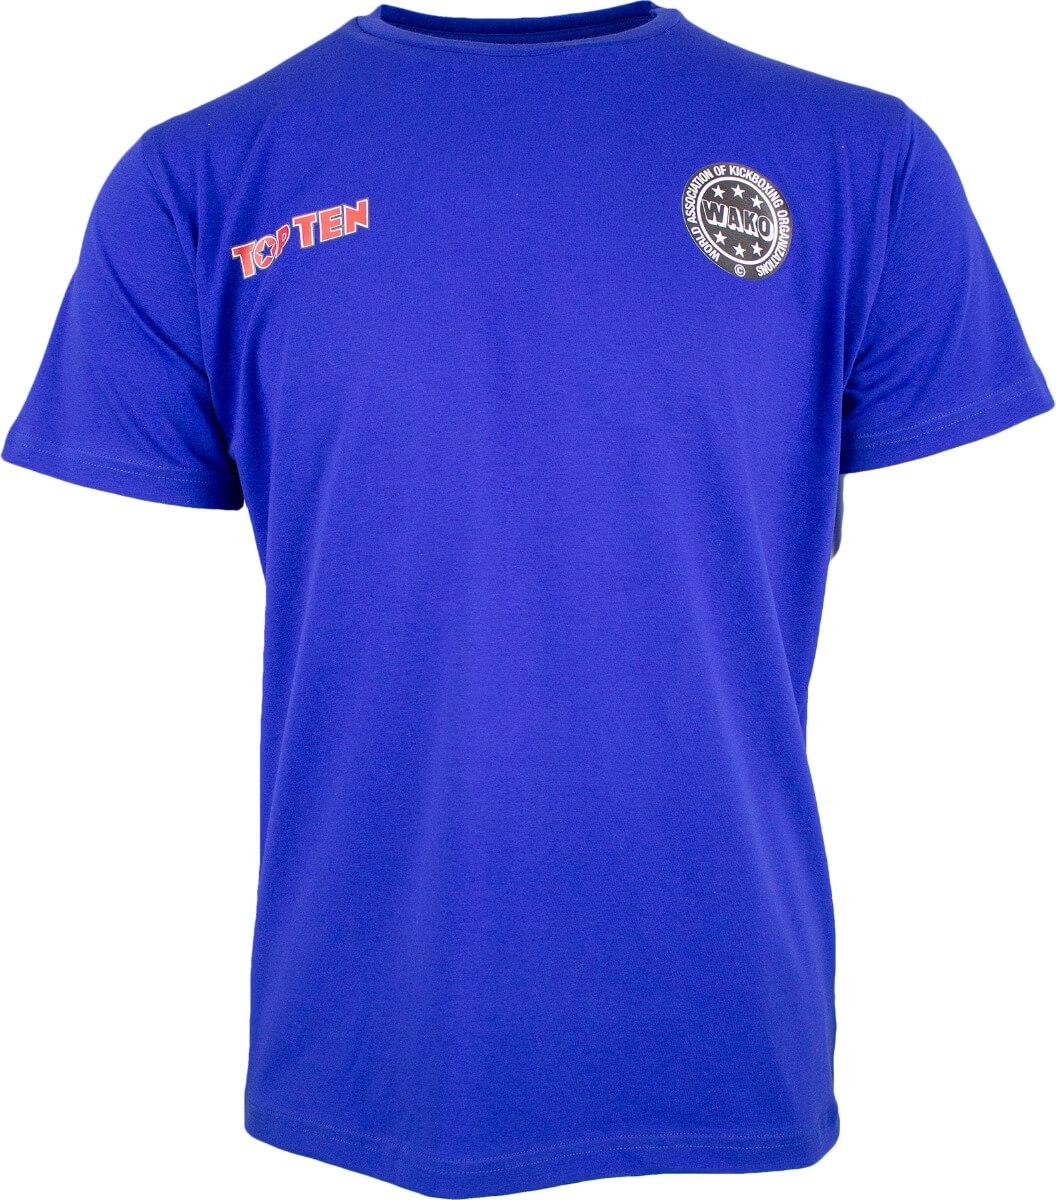 T-Shirt WAKO No. 1 Blau Front